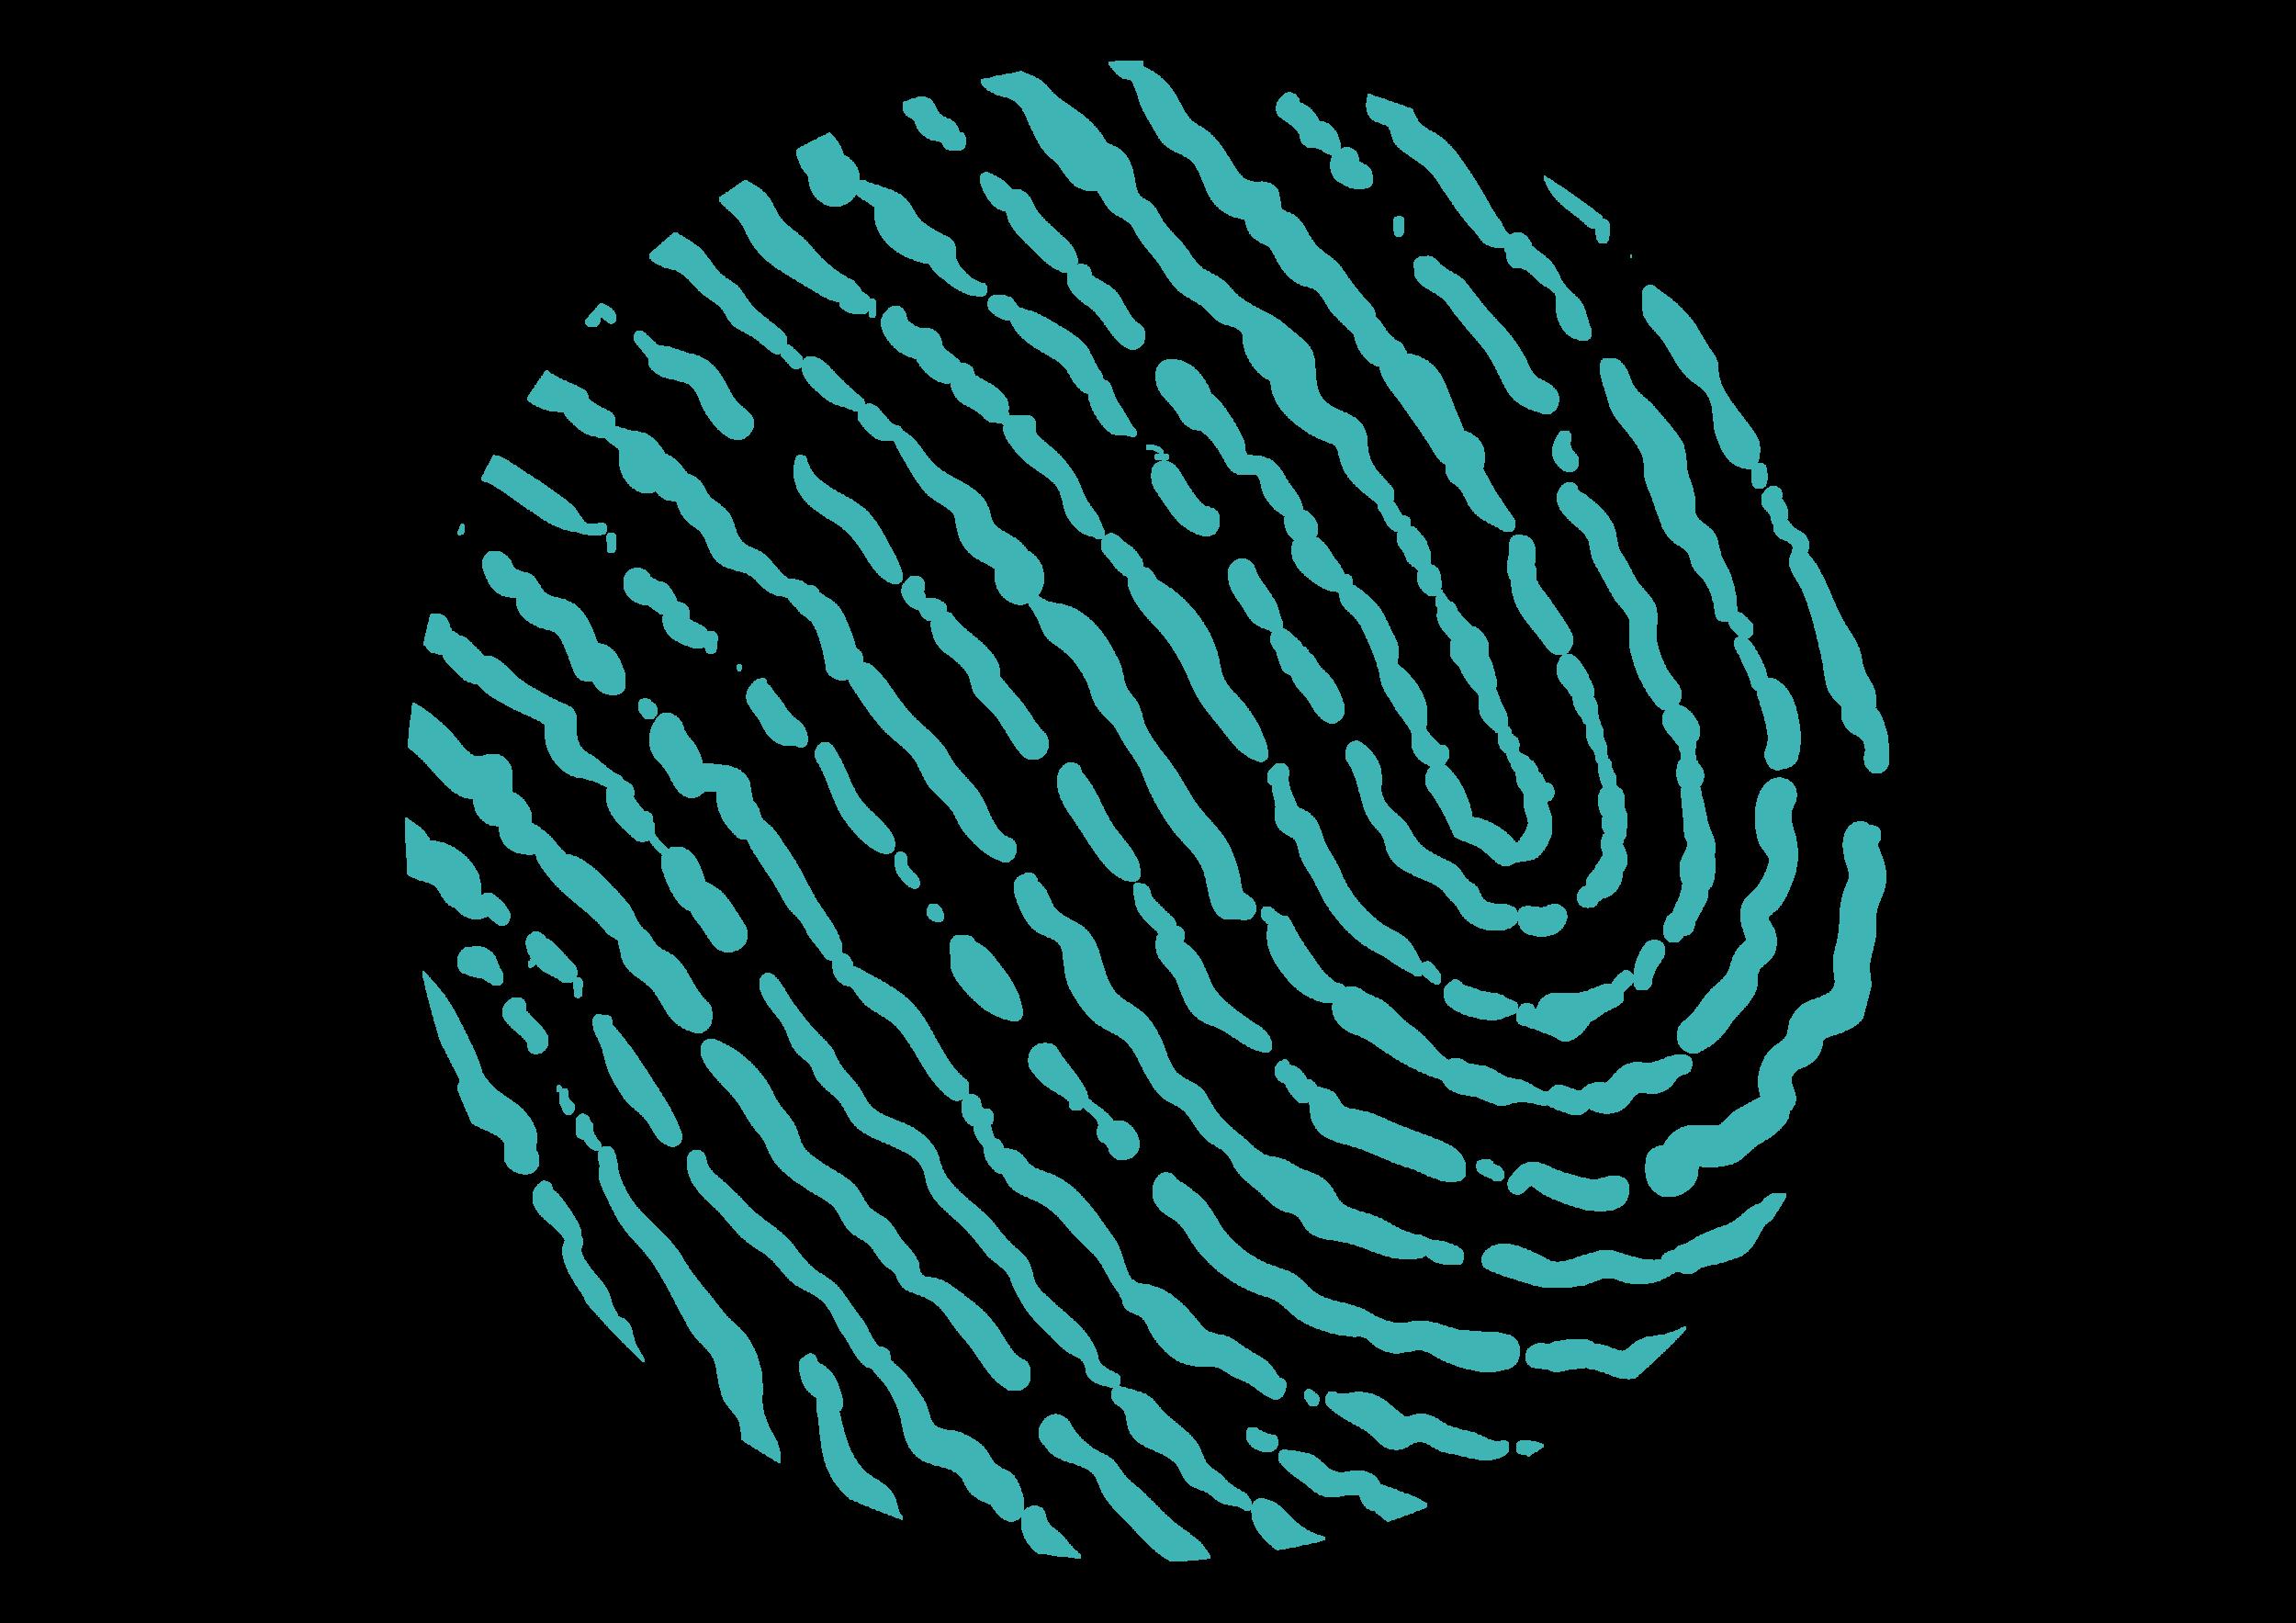 Fingerprint_1.png